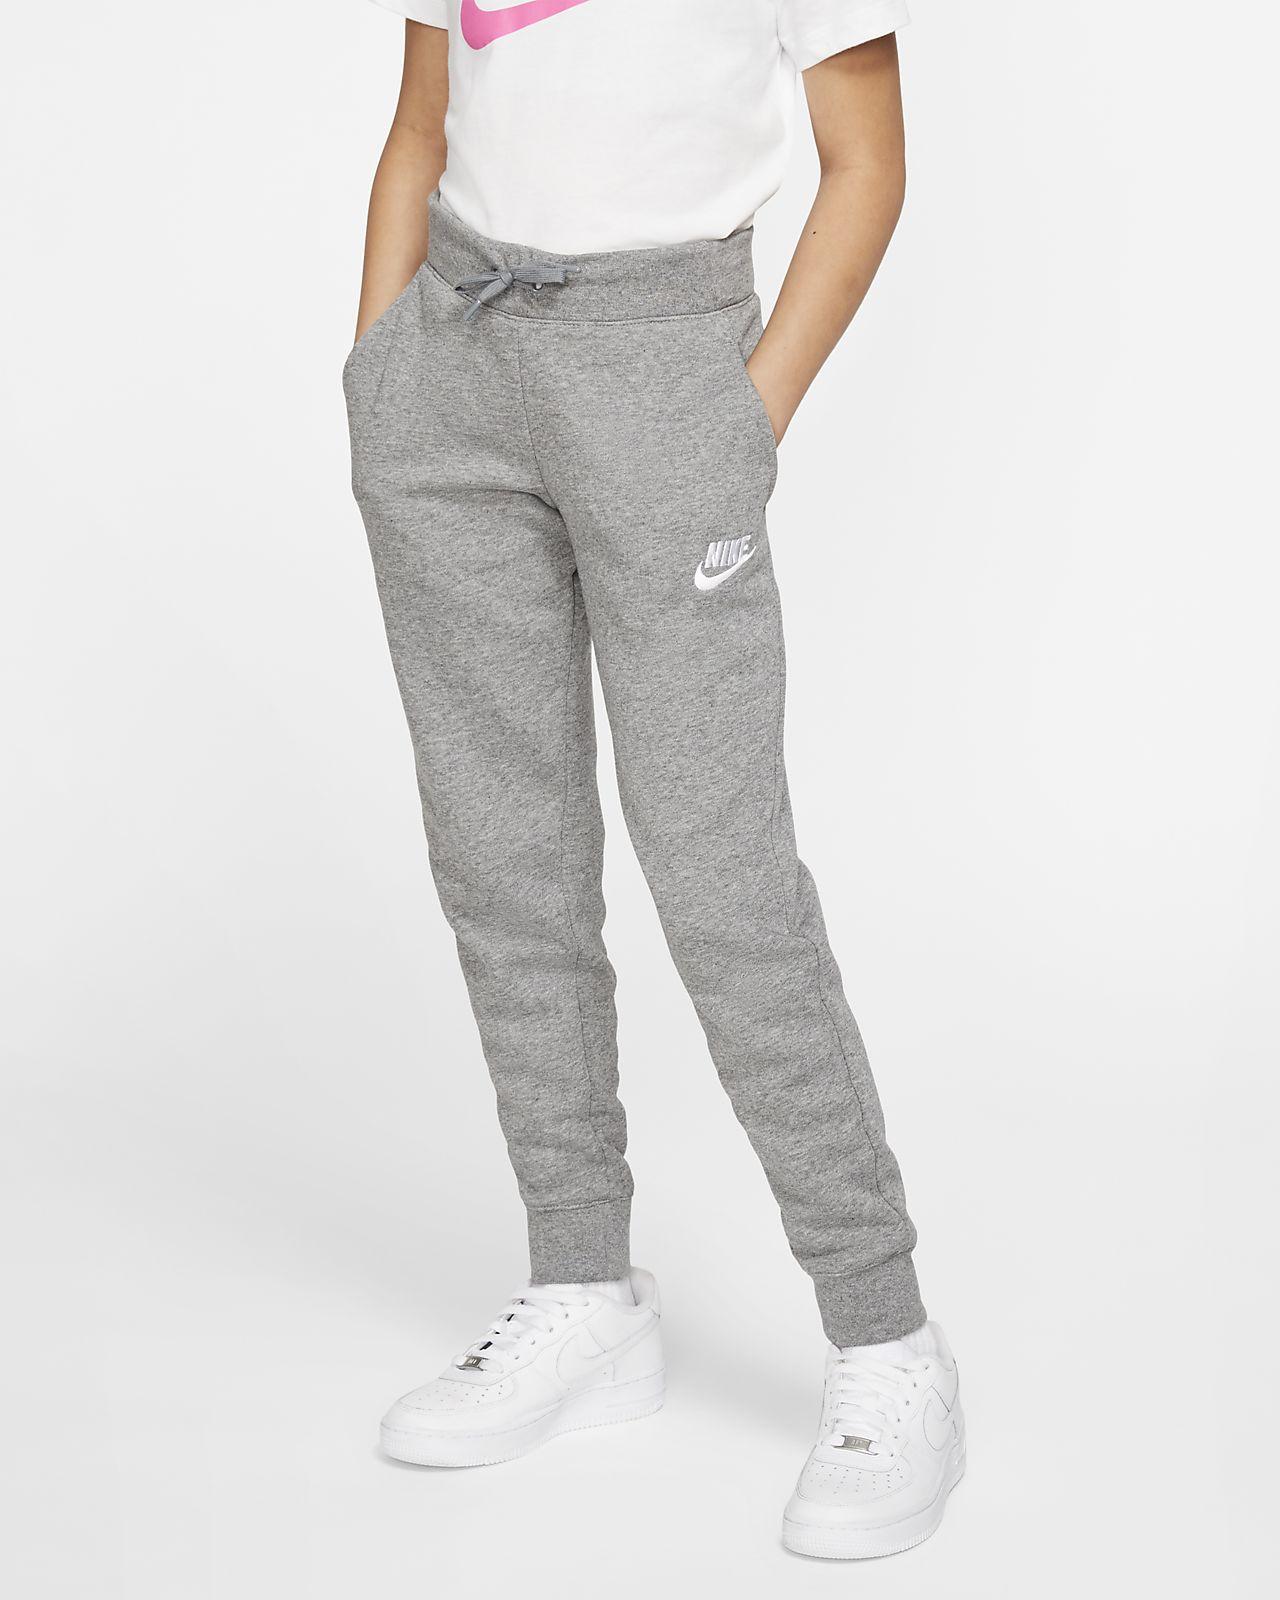 Pantaloni Nike Sportswear Ragazza